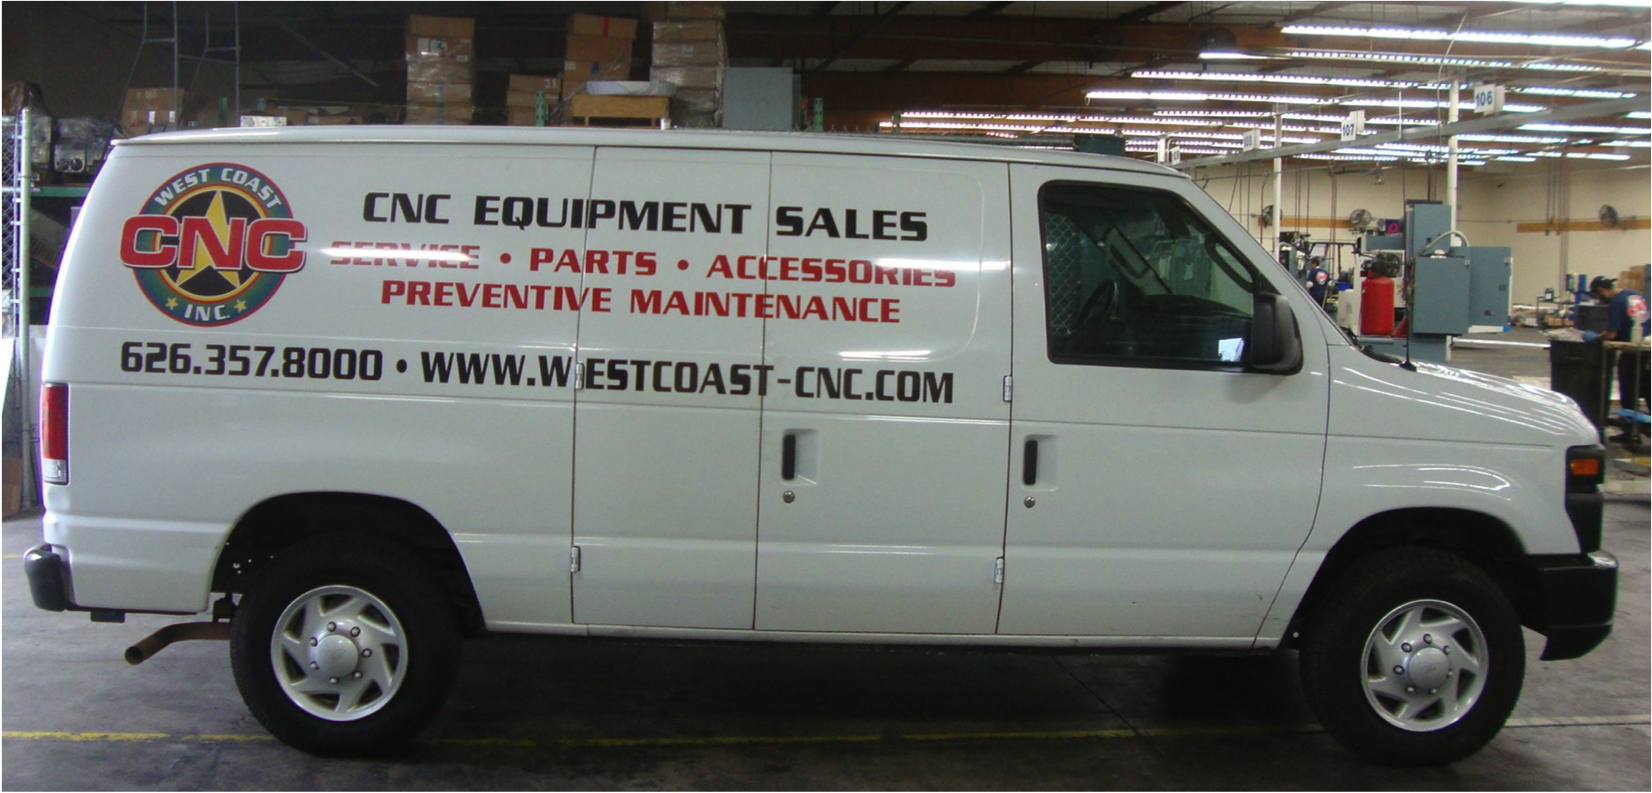 West Coast CNC Service (1 of 3)